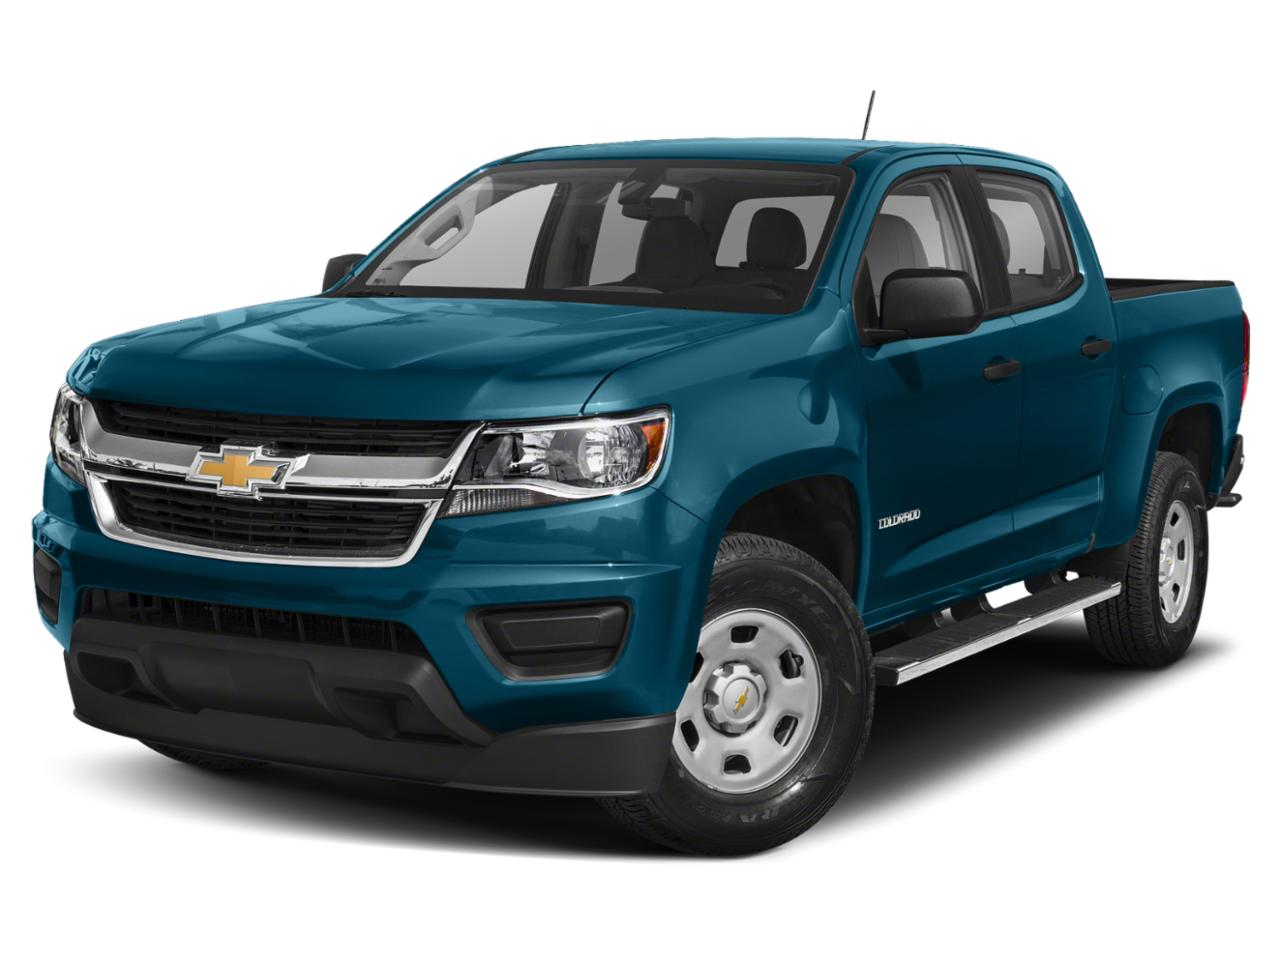 2020 Chevrolet Colorado Vehicle Photo in Little Falls, NJ 07424